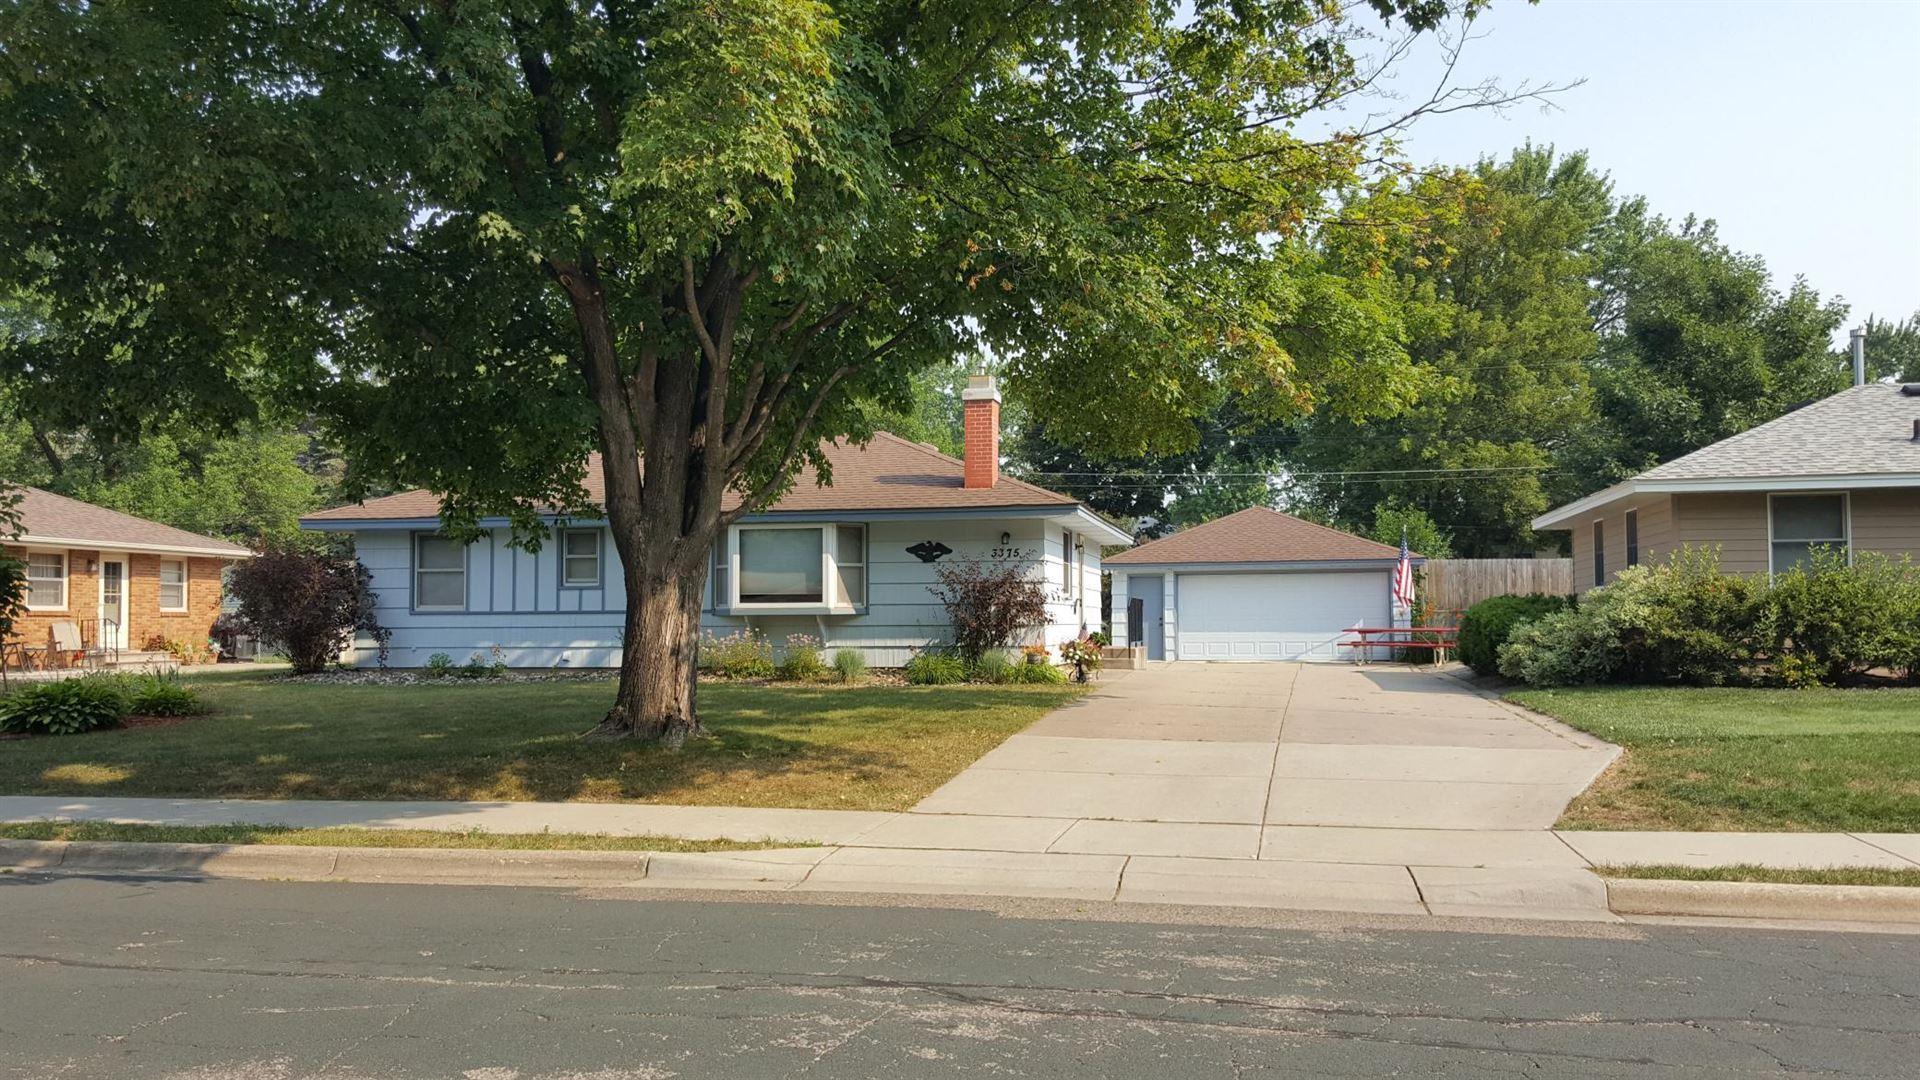 Photo of 3375 144th Street W, Rosemount, MN 55068 (MLS # 6102826)